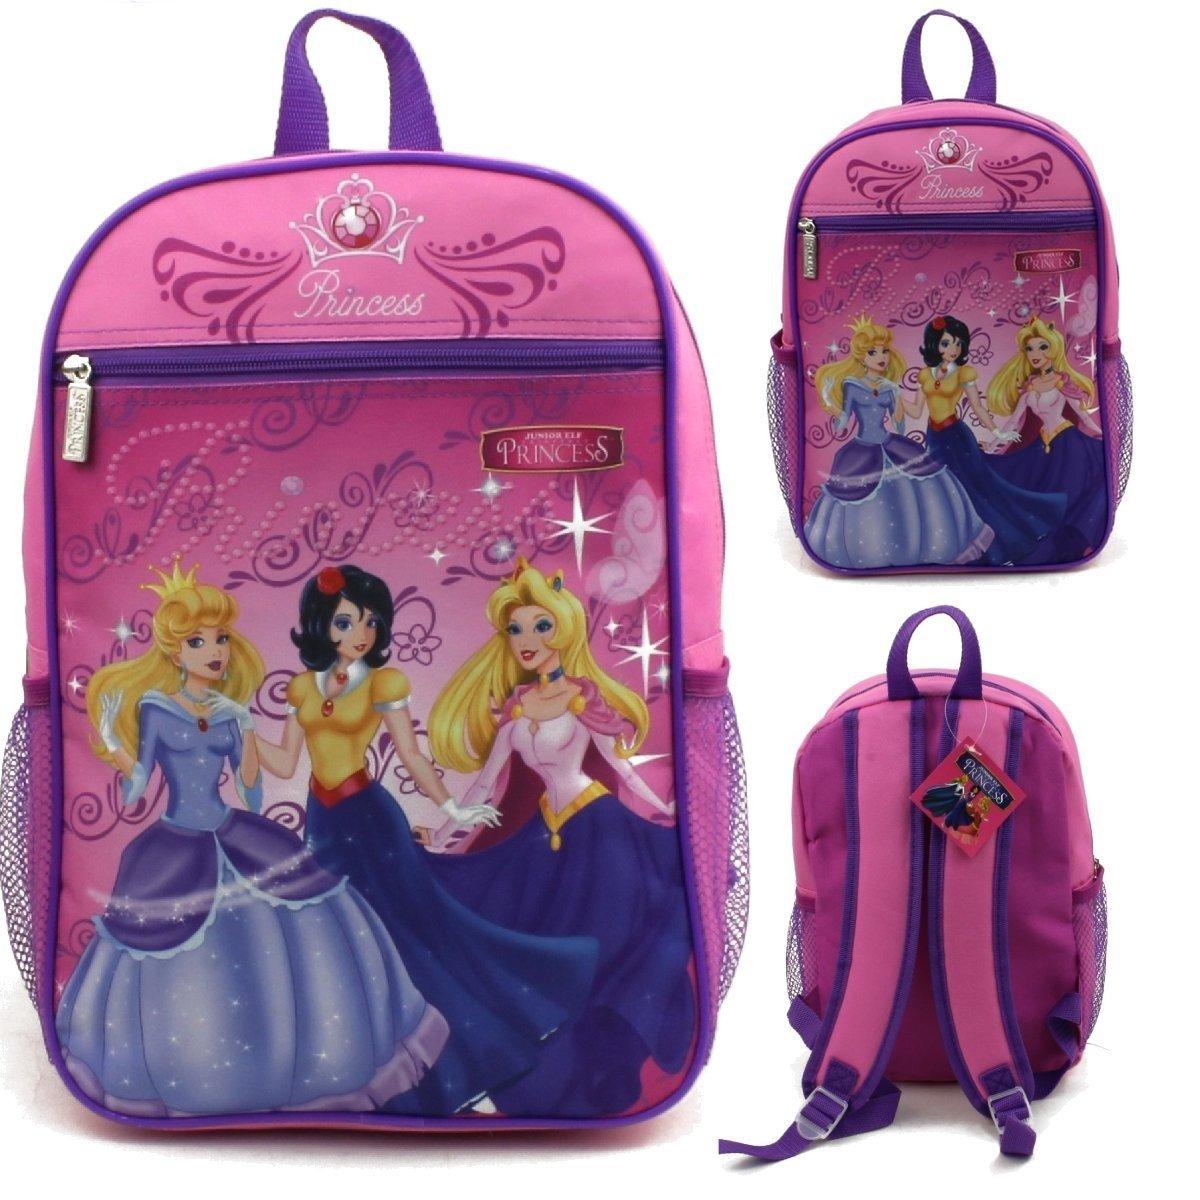 15'' Wholesale Junior Elf Princess - Case of 24 by Toon Studio